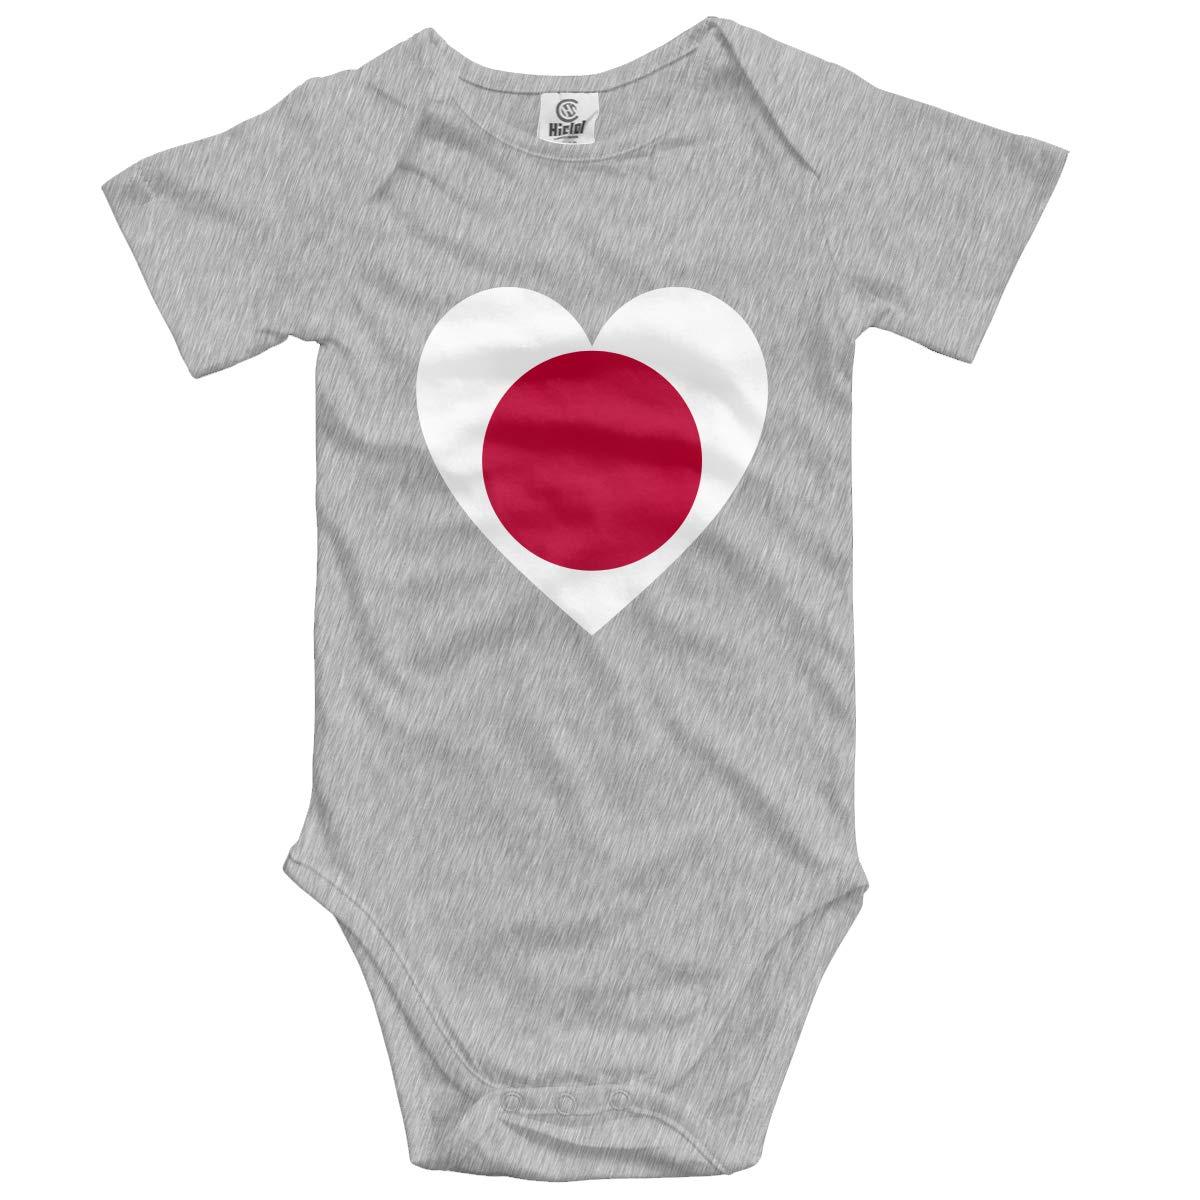 Baby Short-Sleeve Onesies Love Japan Flag Bodysuit Baby Outfits